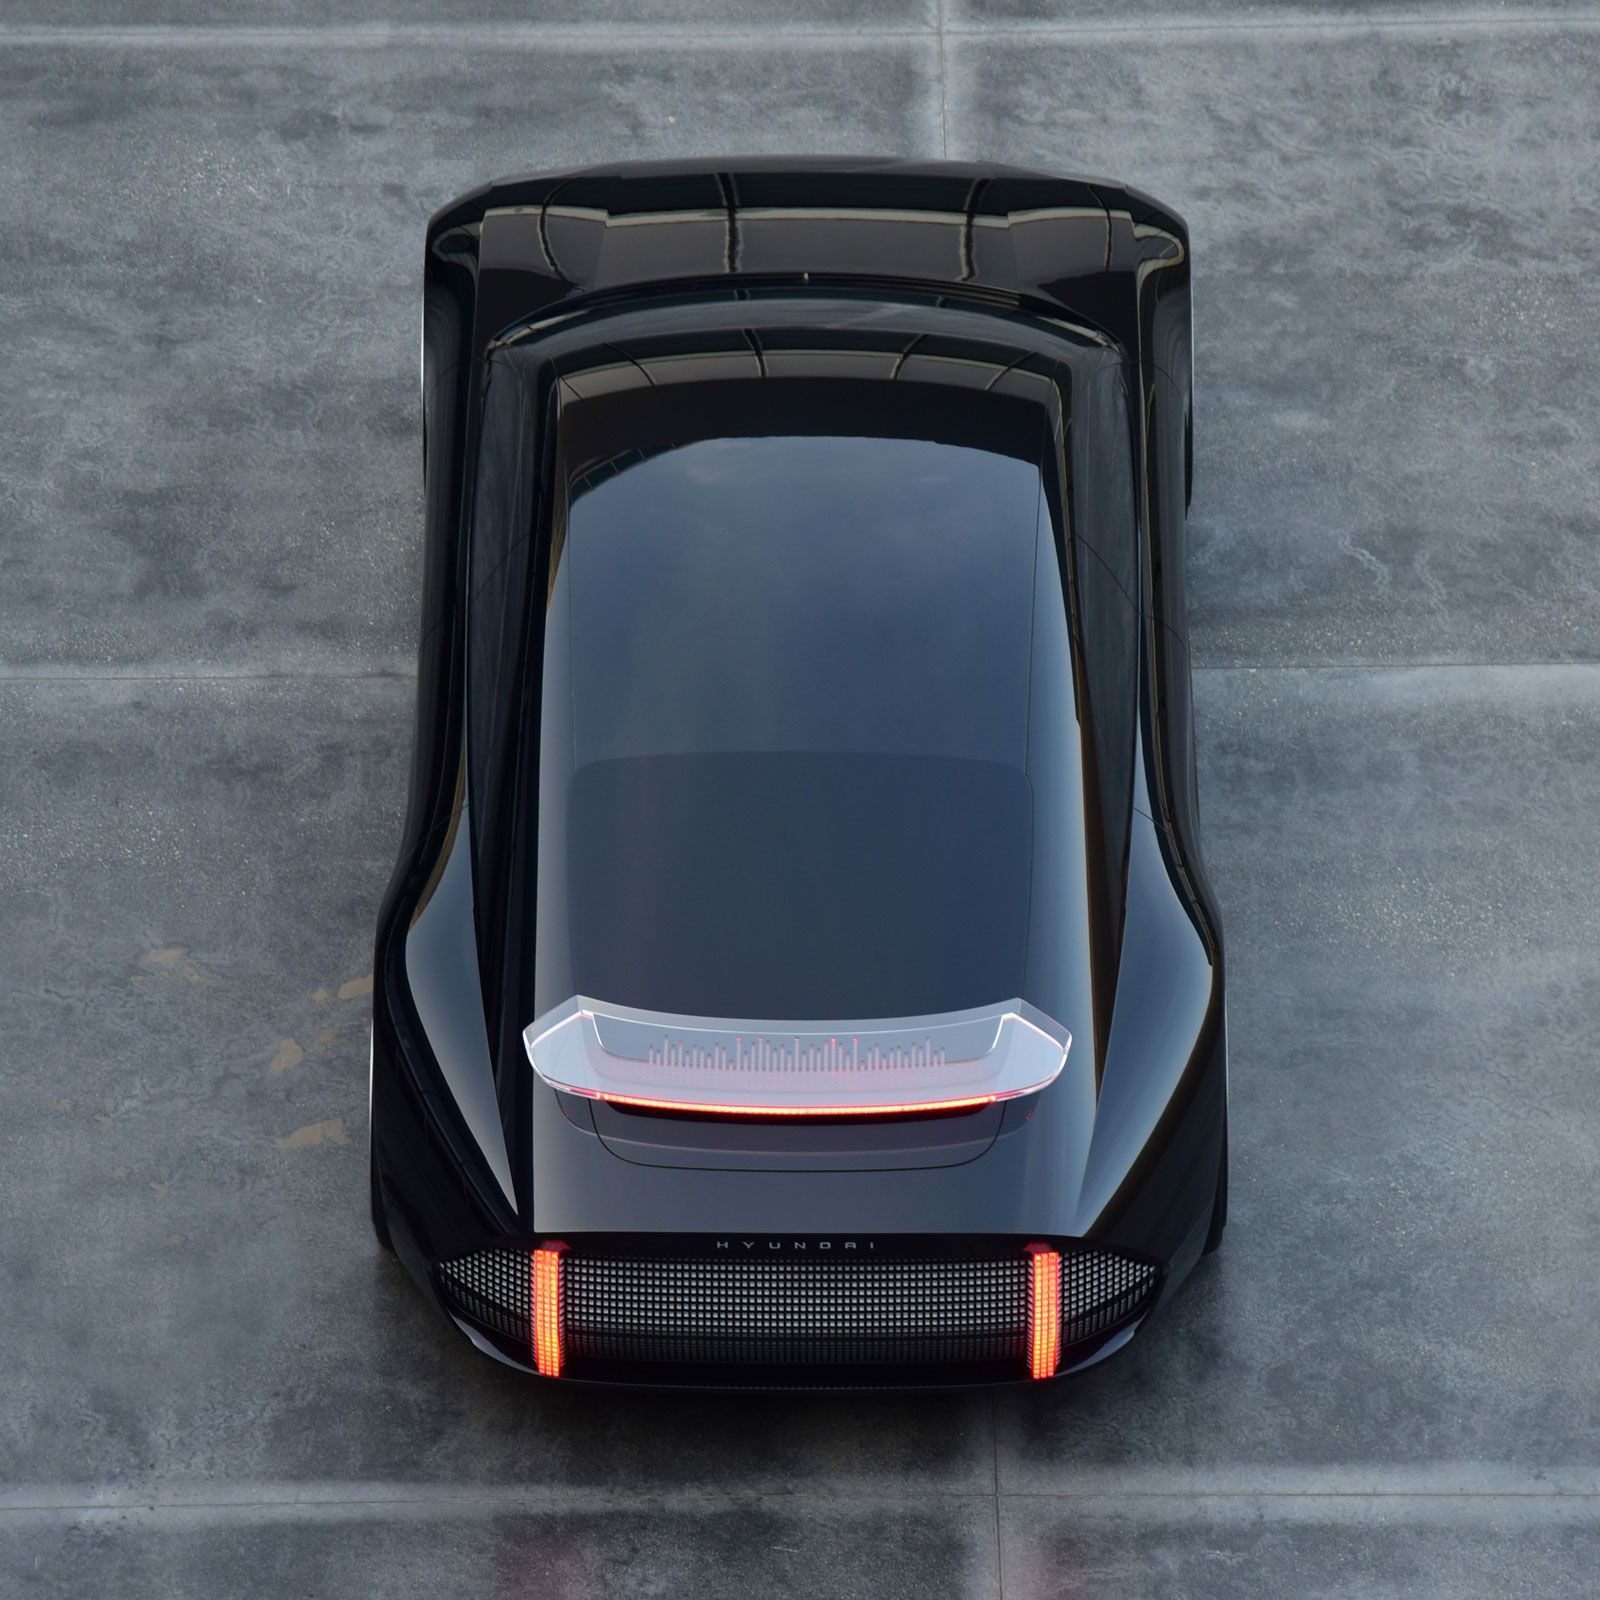 Hyundai Prophecy Concept  #ConceptCar #Hyundai #CarDesign #conceptcars #cardesign #futuristiccars #design #futuristic #autodesign #automotive #car #cargram #electriccars #autonomouscars #Design #carbodydesign